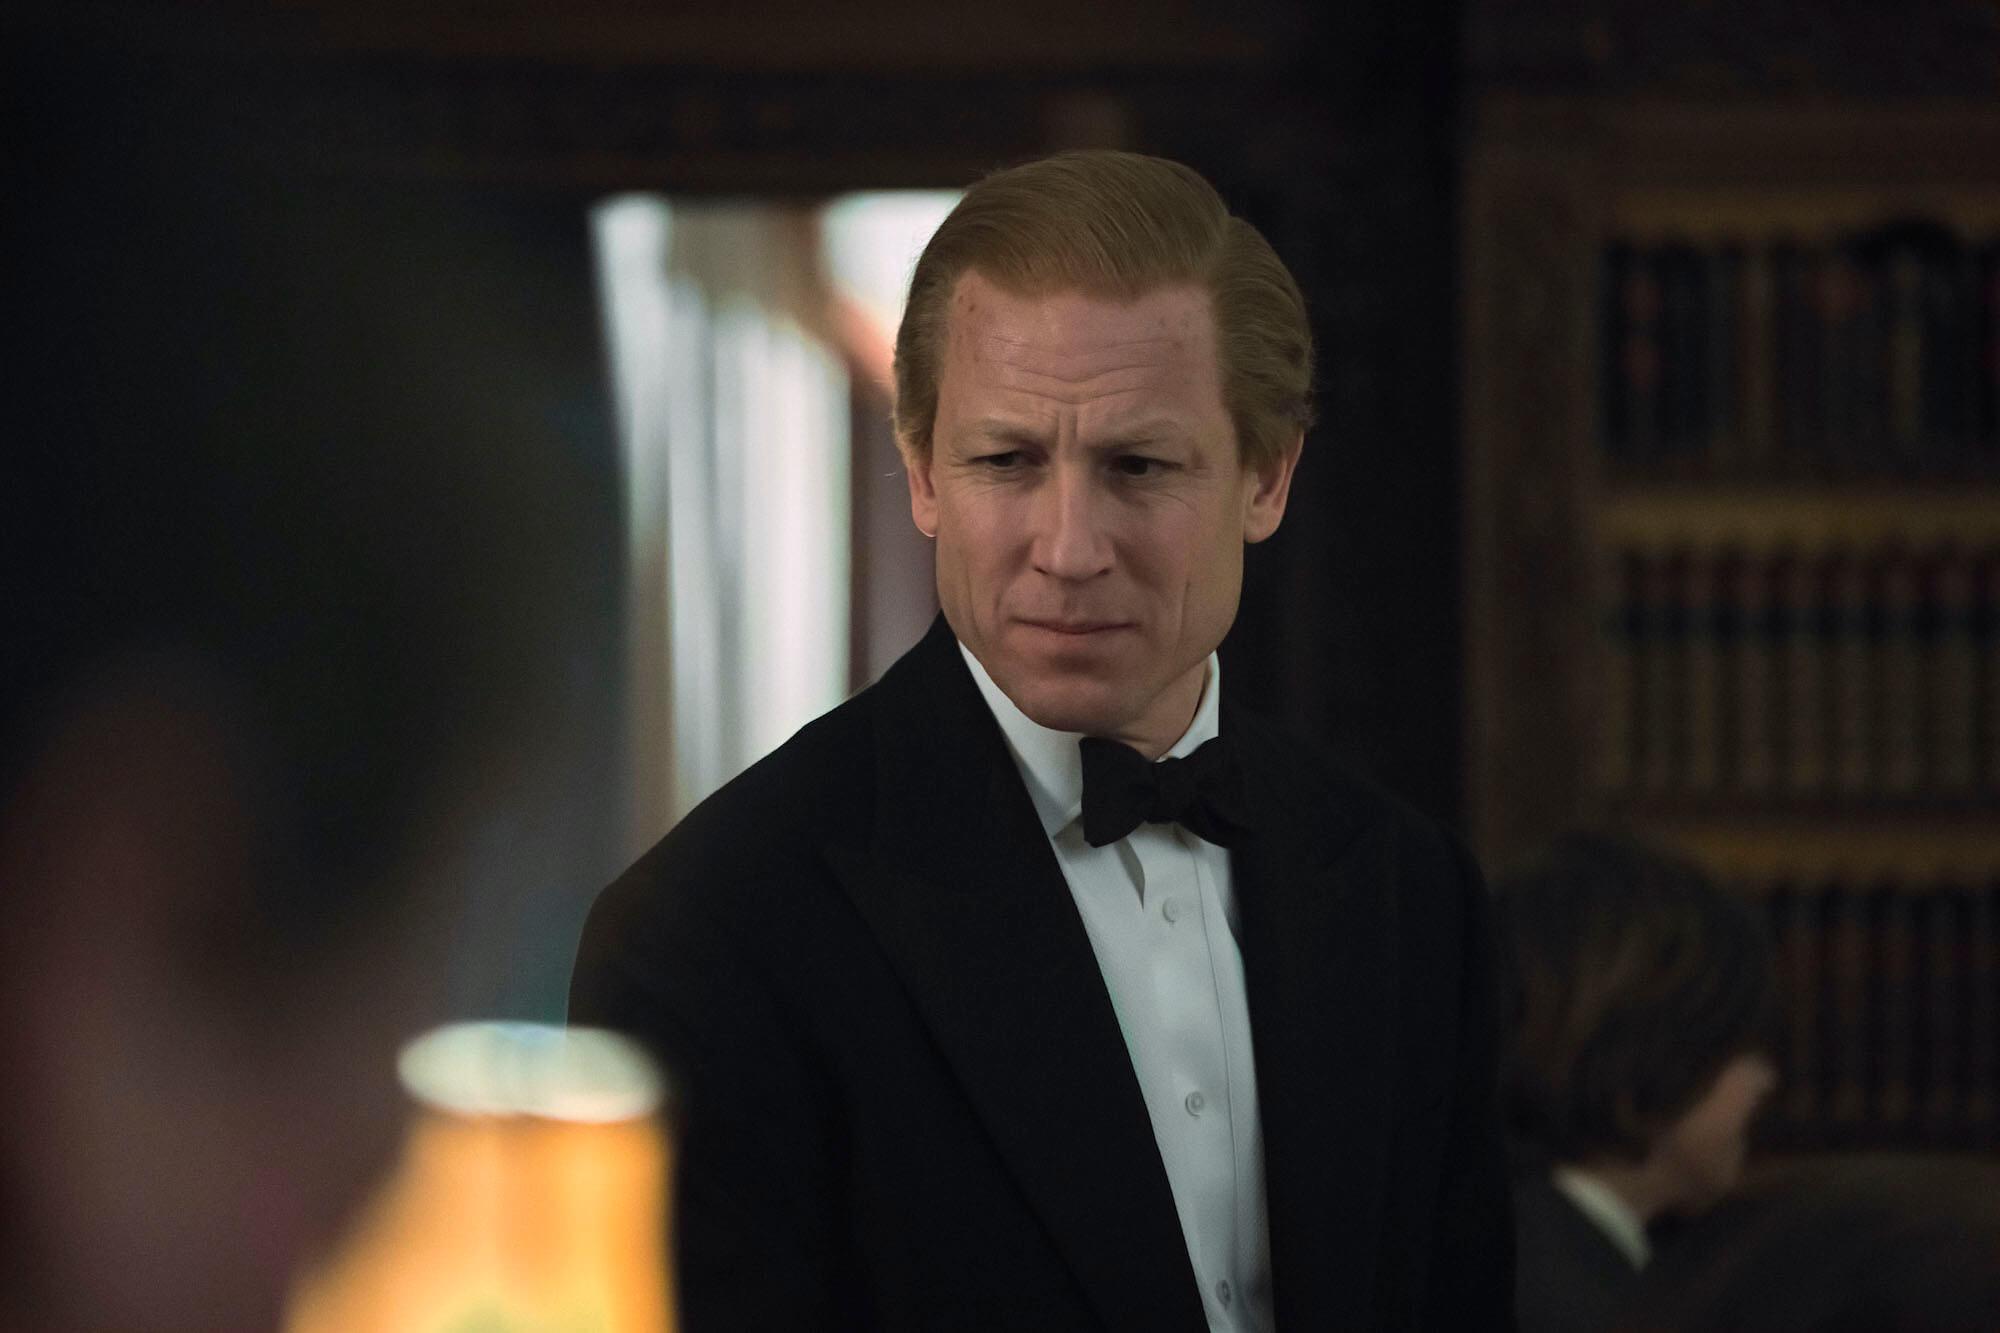 Tobias Menzies as Philip in The Crown S4